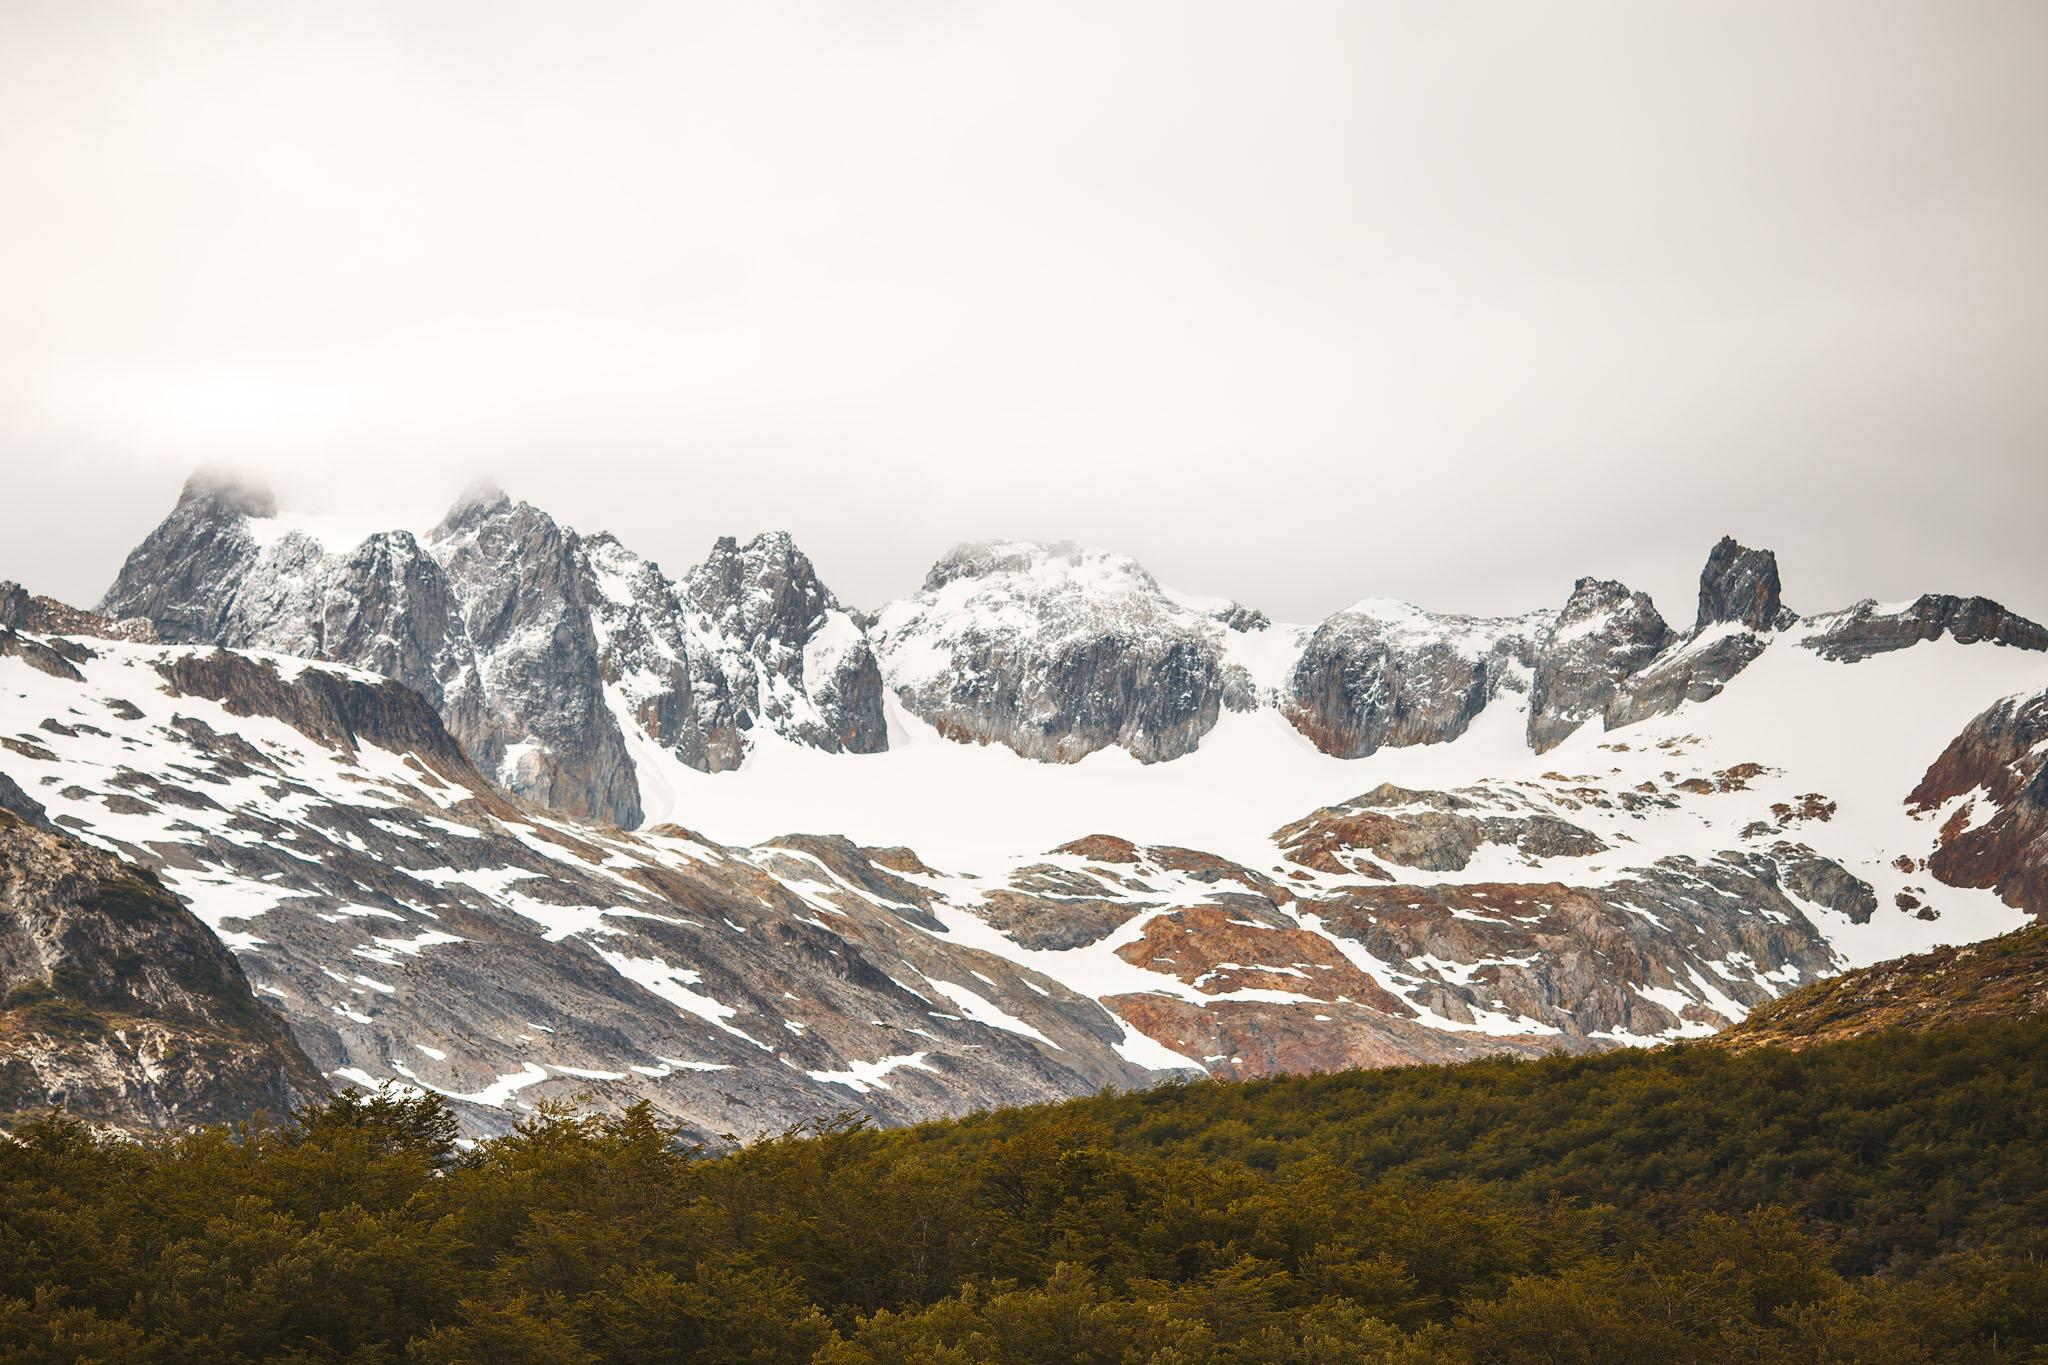 Wedding_Travellers_Ushuaia_Overlanding_fin_del_mundo-laguna-esmeralda-mountains-snow-forest